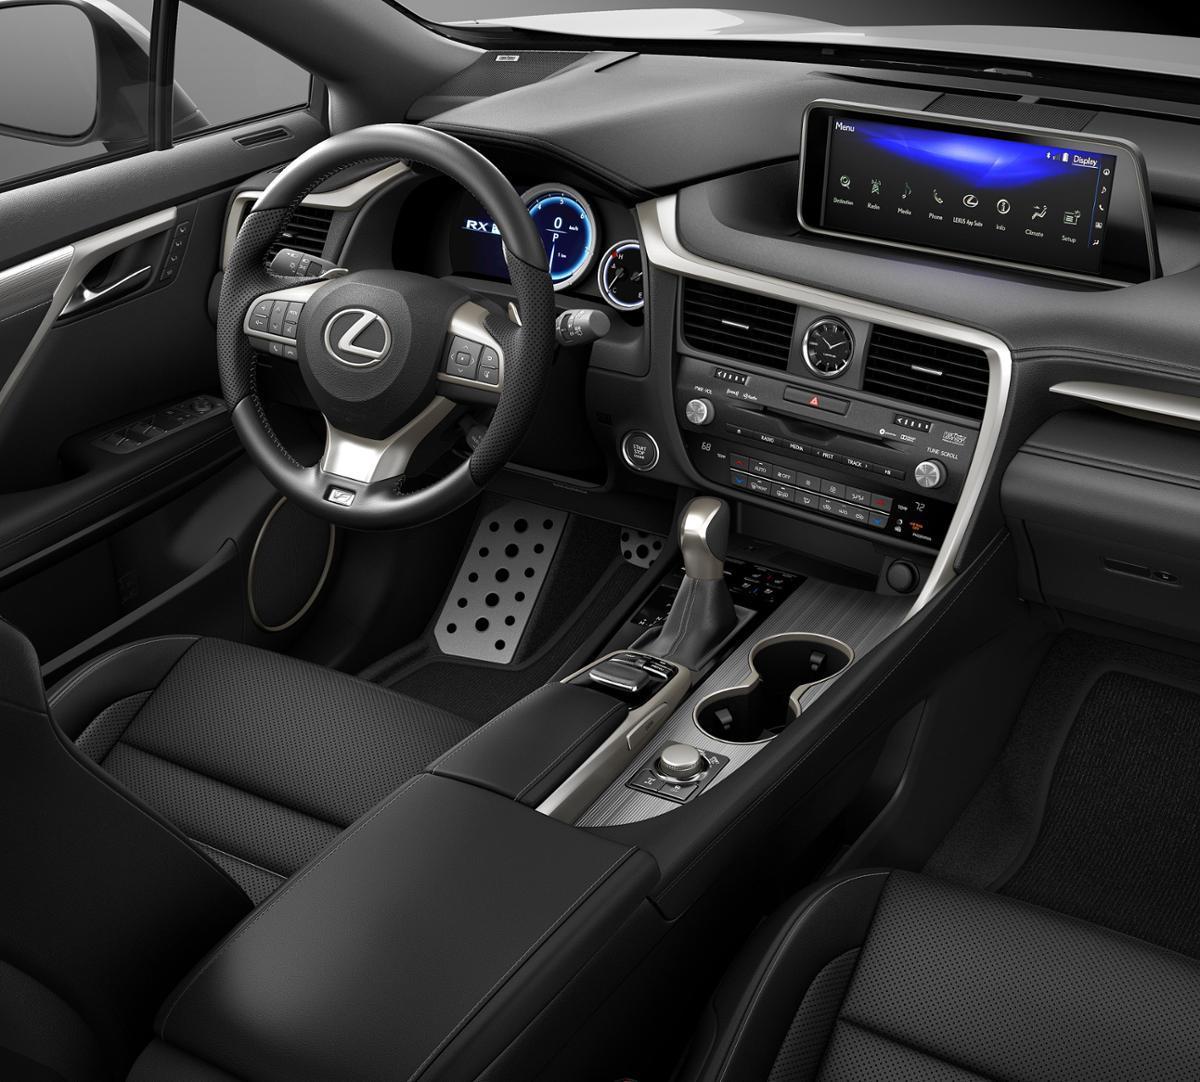 Lexus Rx350 Lease: New Matador Red Mica 2017 Lexus RX 350 F SPORT For Sale